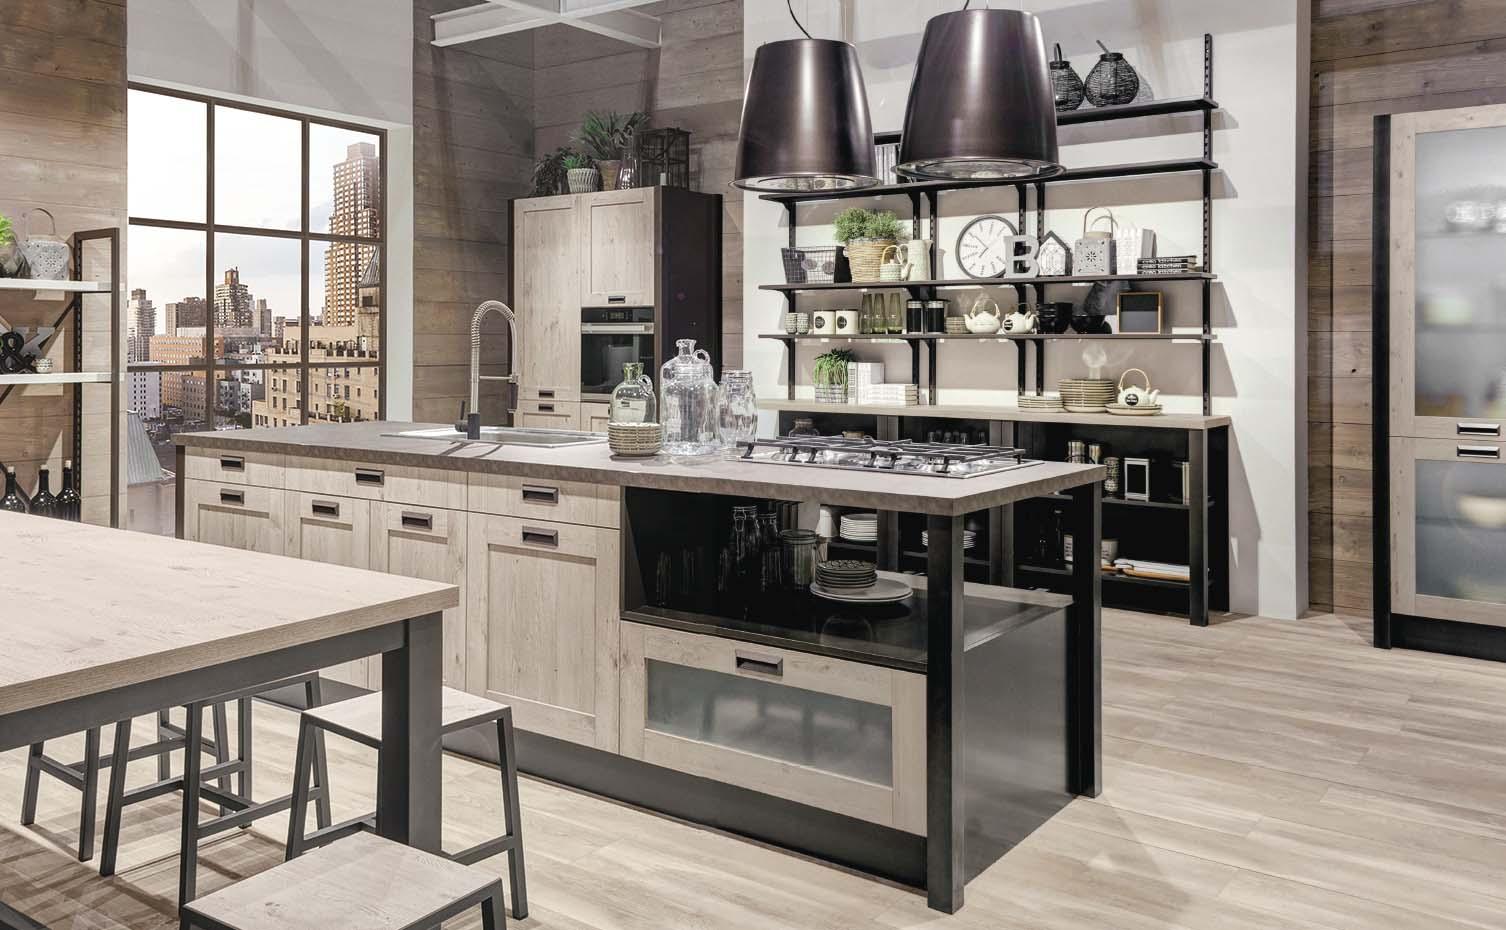 Cucine Moderne Ad Isola.Cucina A Isola La Nuova Tendenza